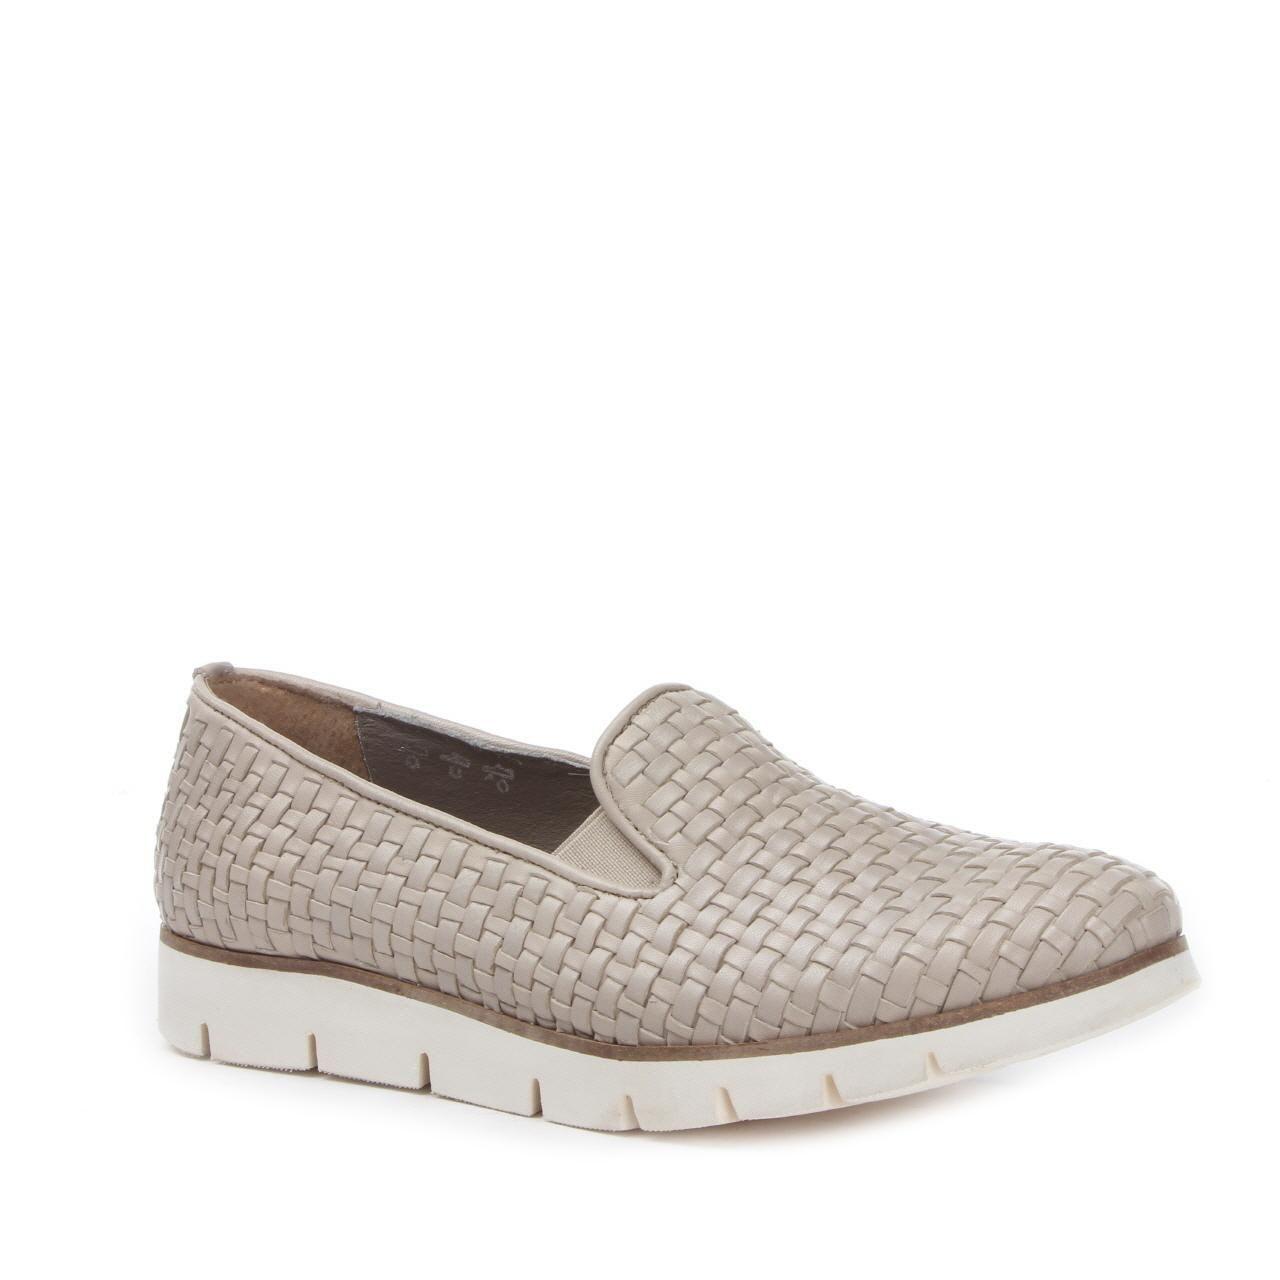 nike air max 90 youth gs schoenen brantano